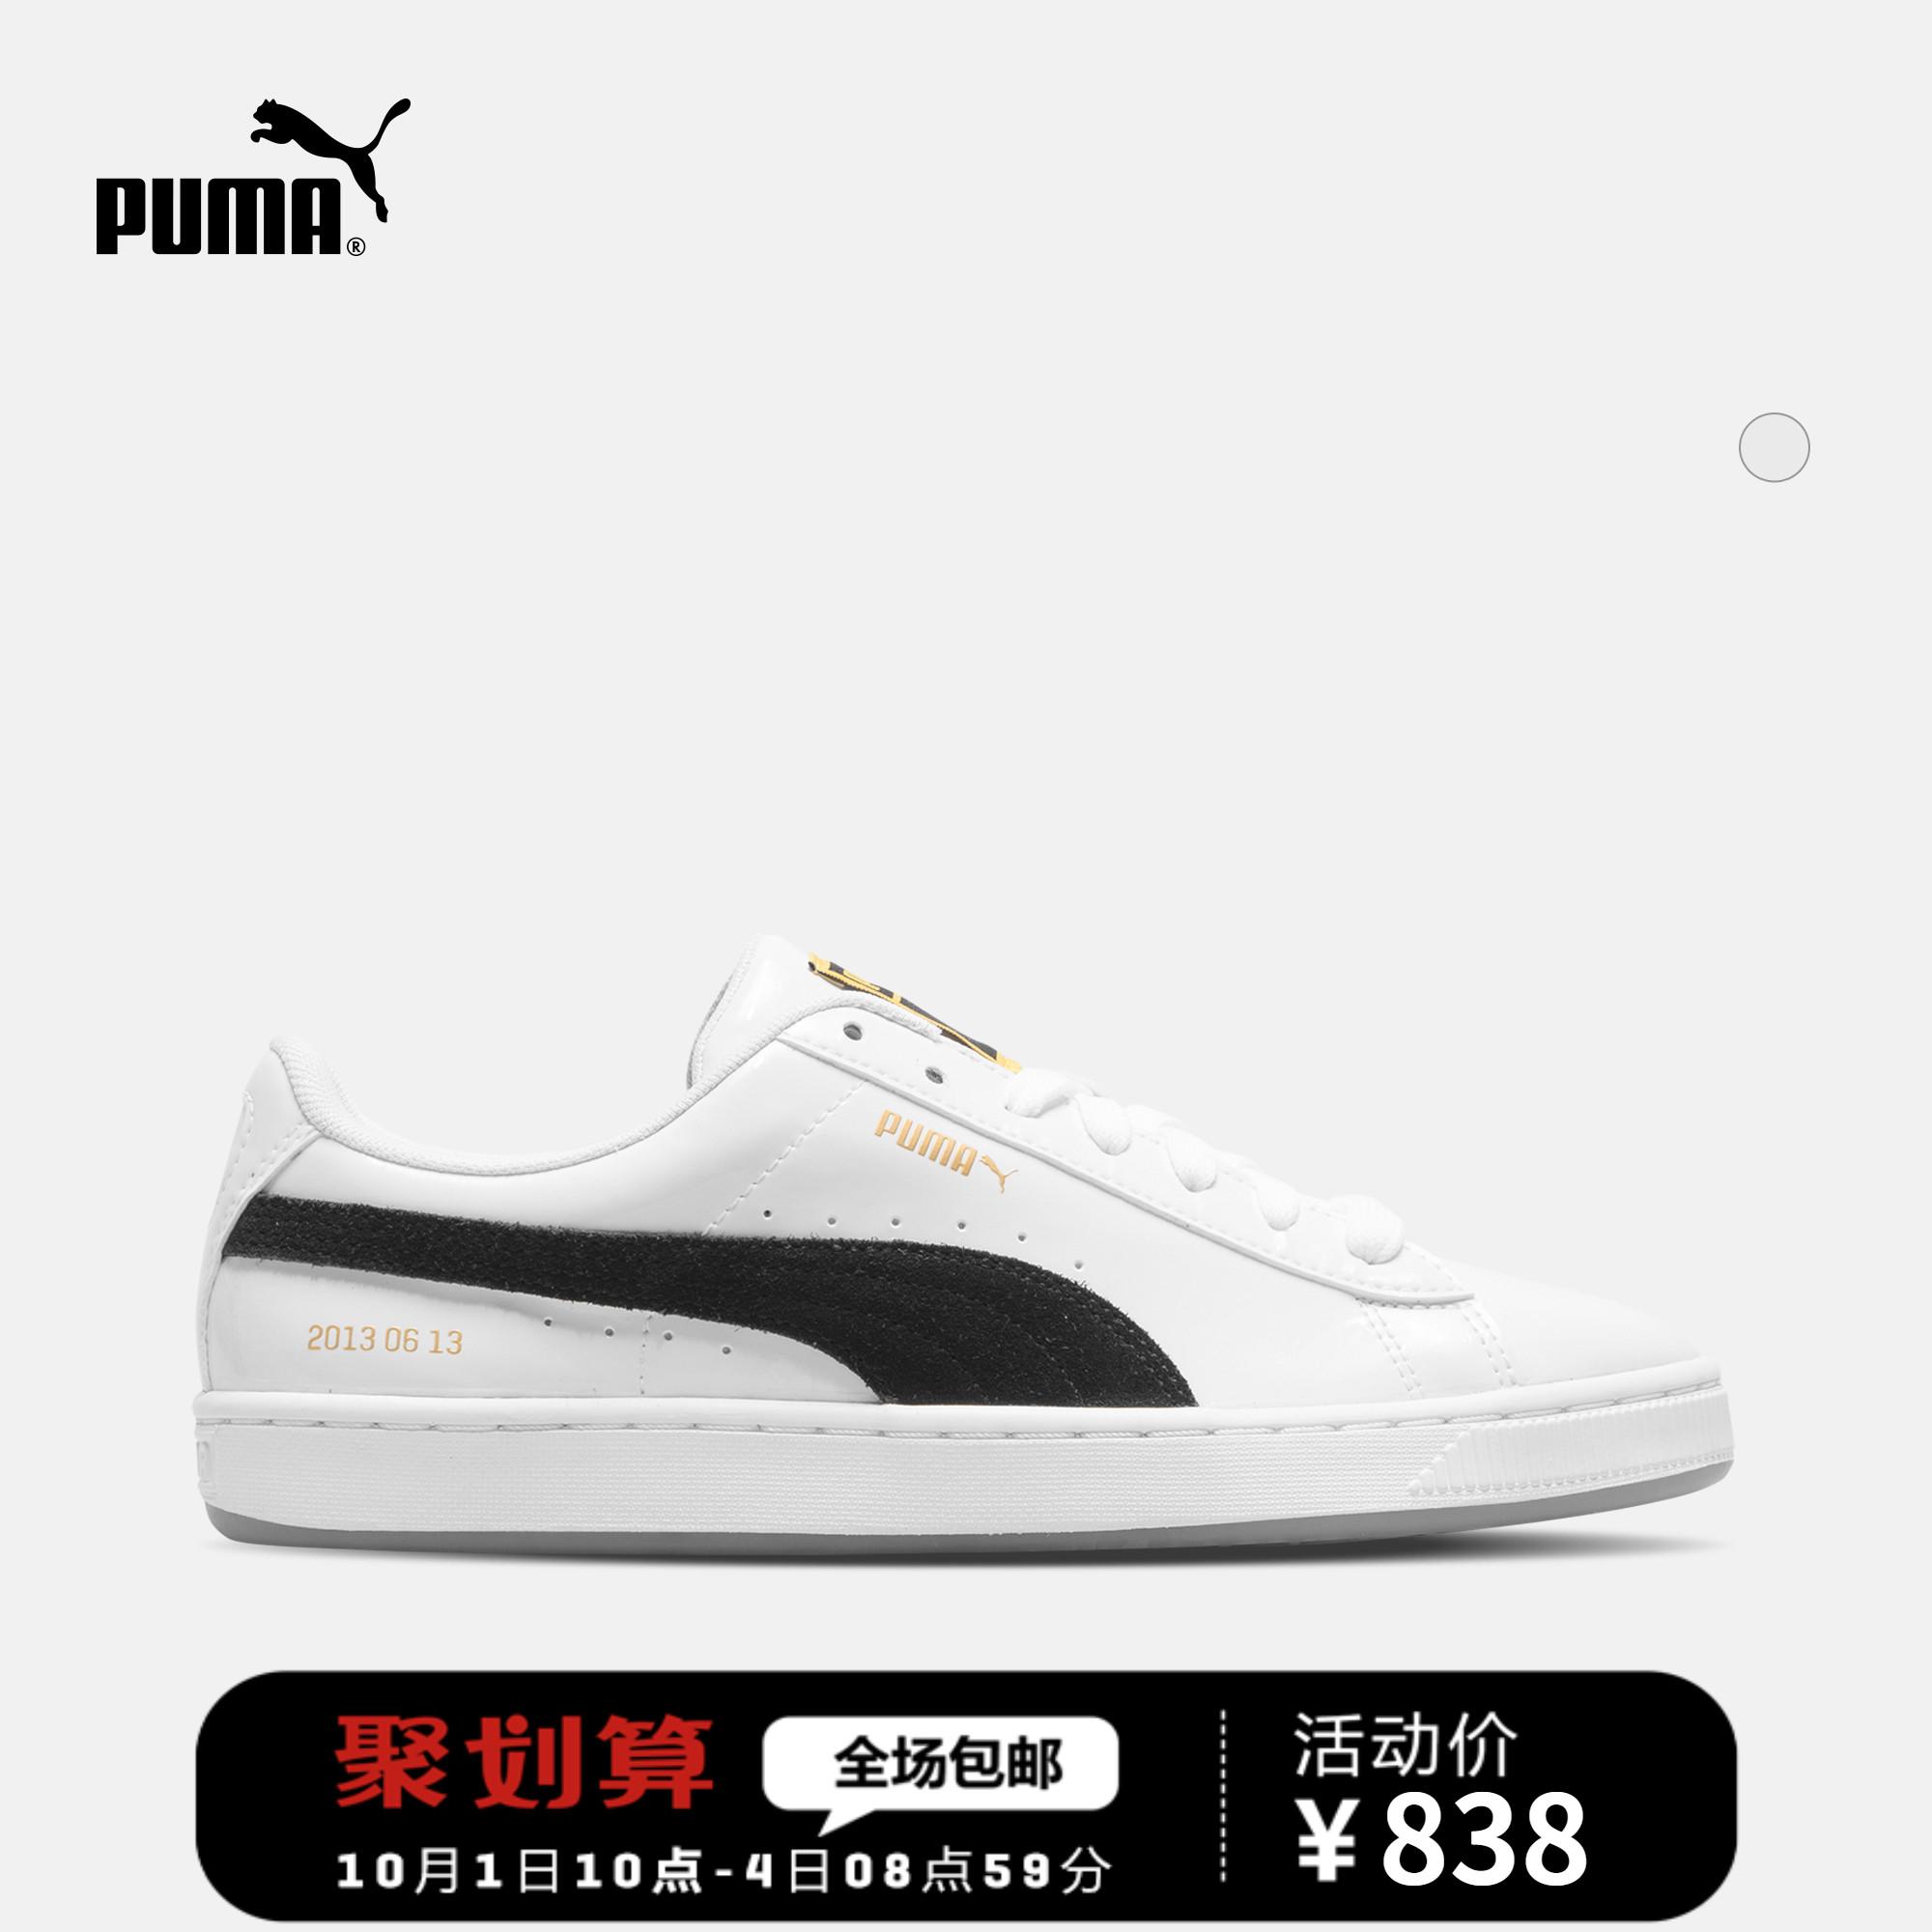 PUMA彪马官方 男女同款漆皮休闲鞋 PUMA X BTS Basket 368278